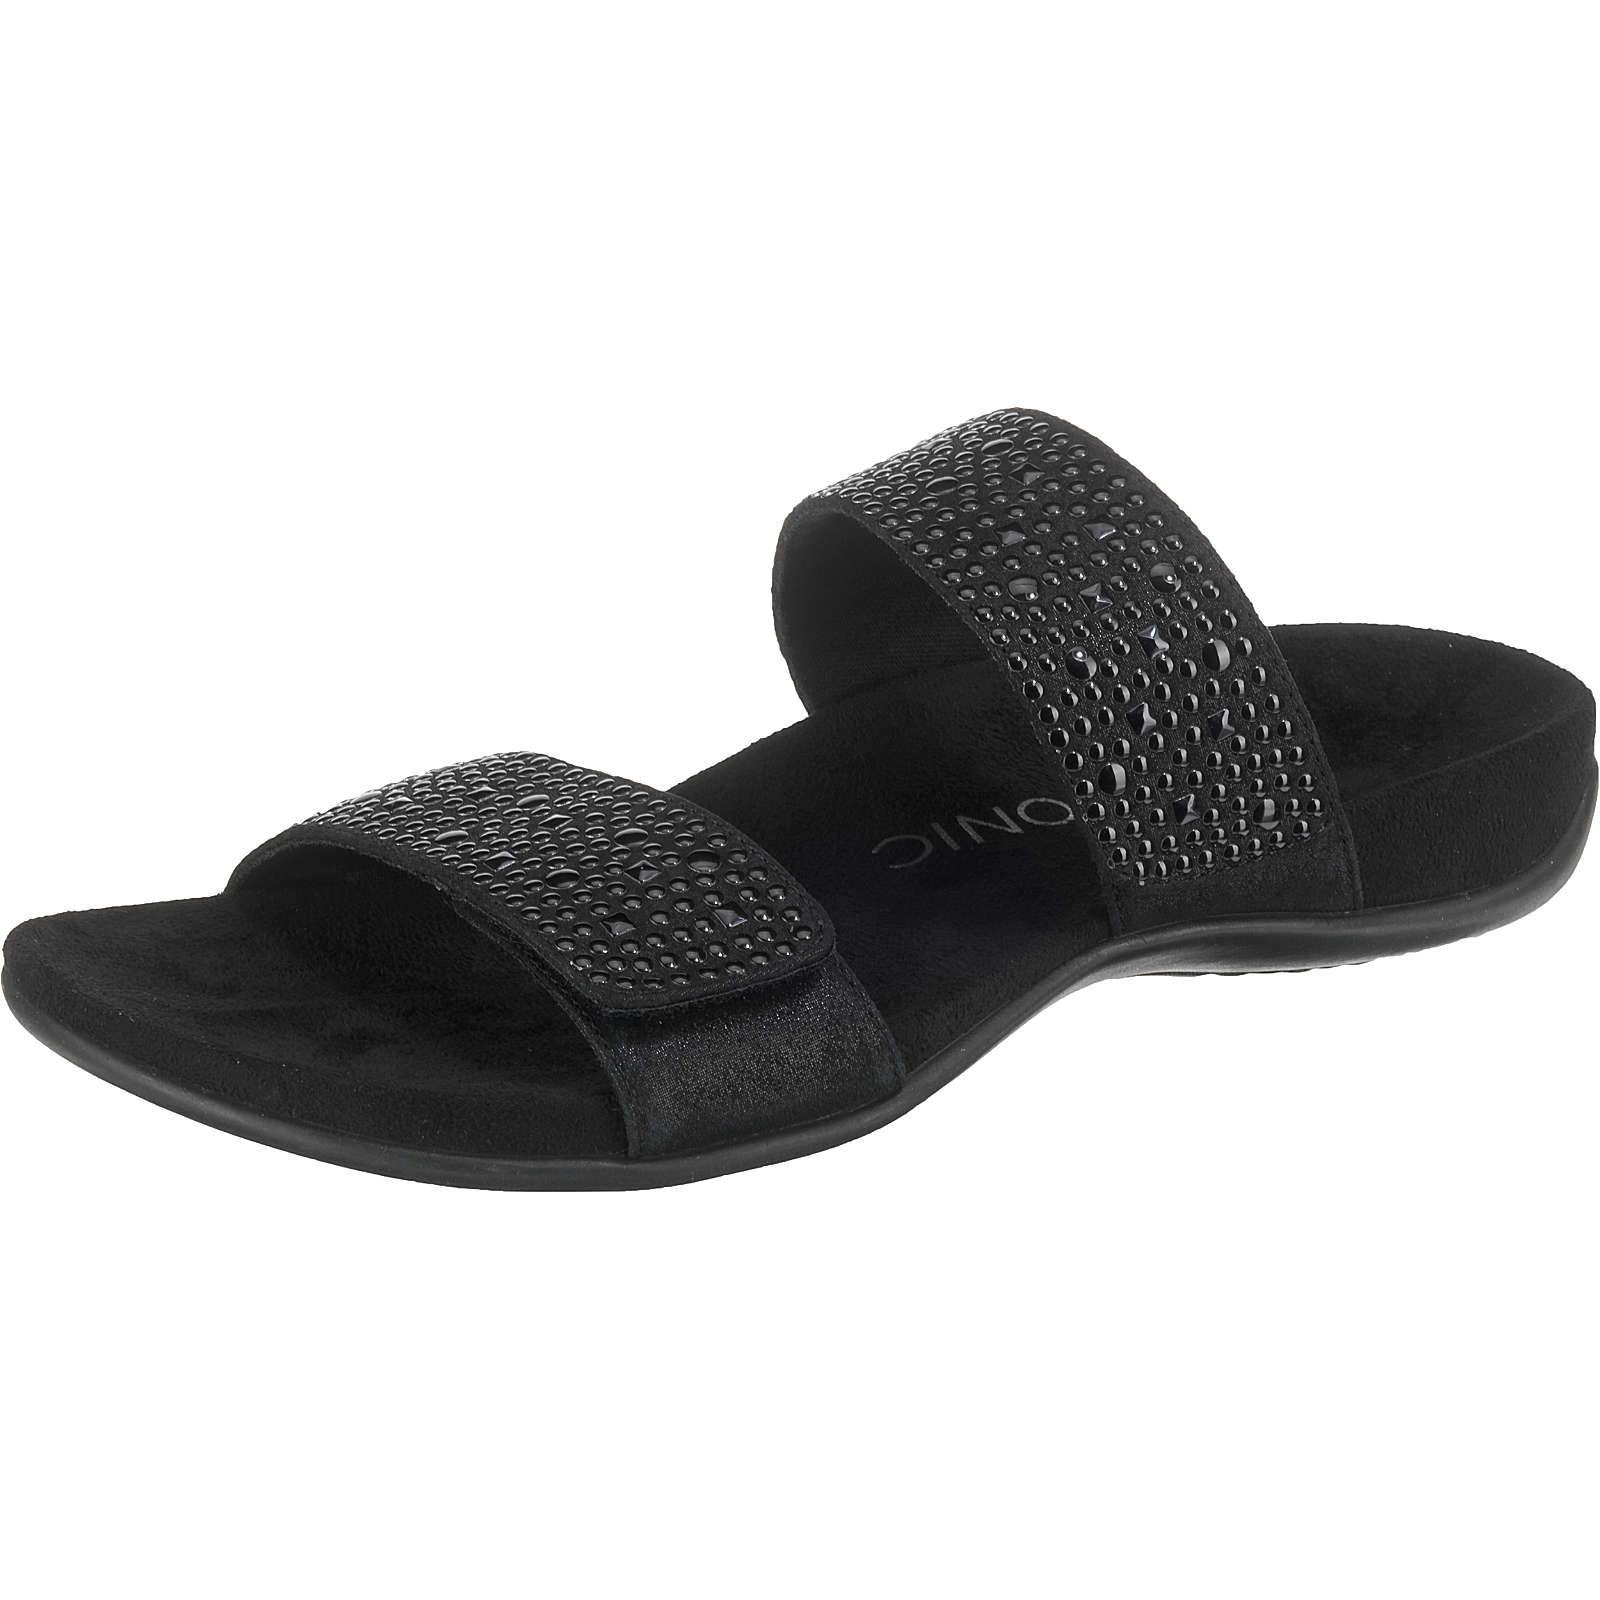 Vionic Samoa Komfort-Pantoletten schwarz Damen Gr. 37